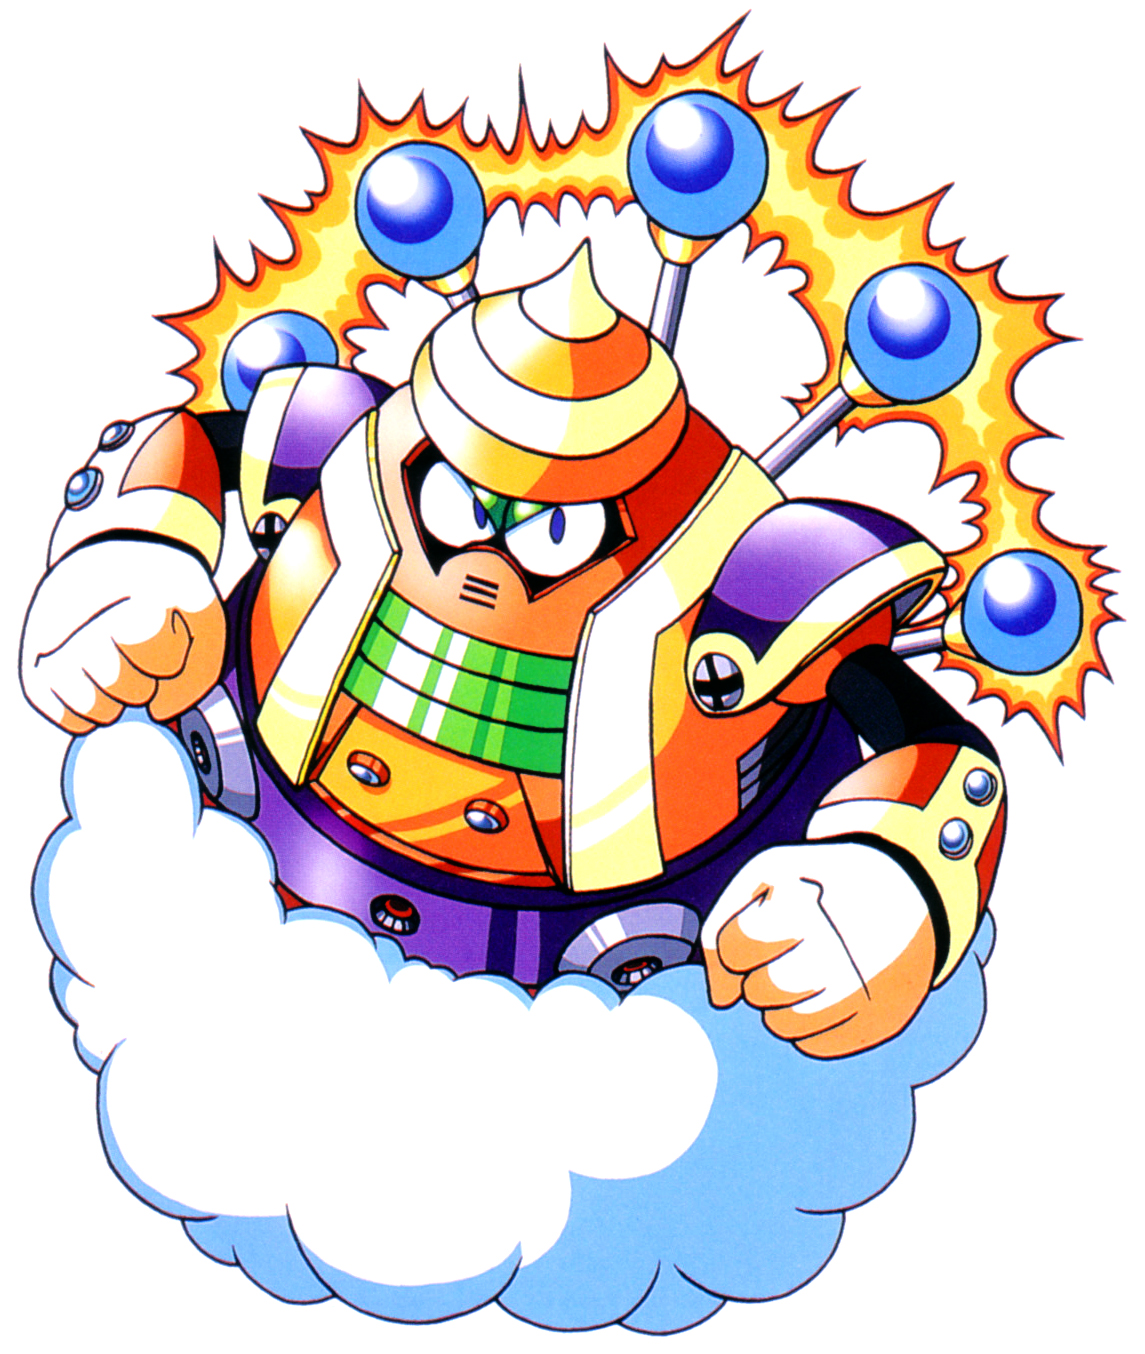 Cloud man mmkb fandom powered by wikia - Megaman wikia ...